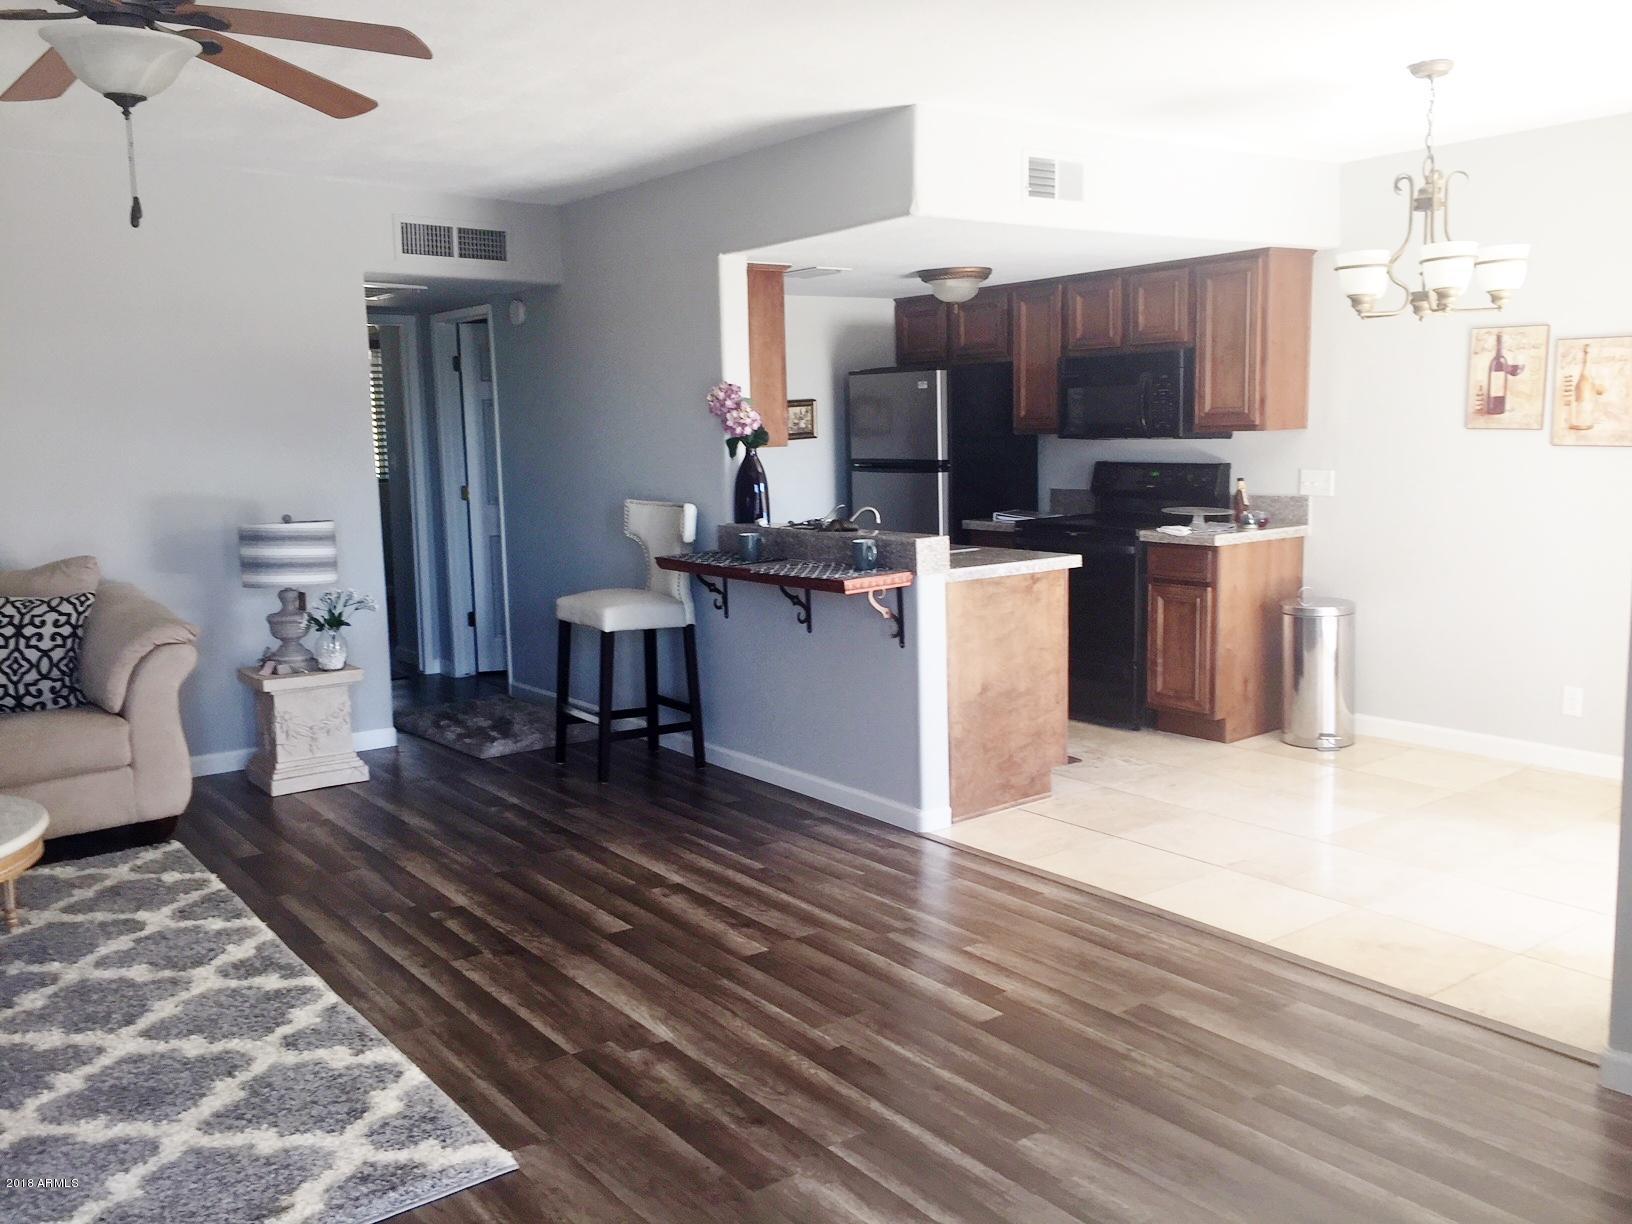 MLS 5840374 14632 N YERBA BUENA Way Unit D, Fountain Hills, AZ 85268 Fountain Hills AZ Affordable